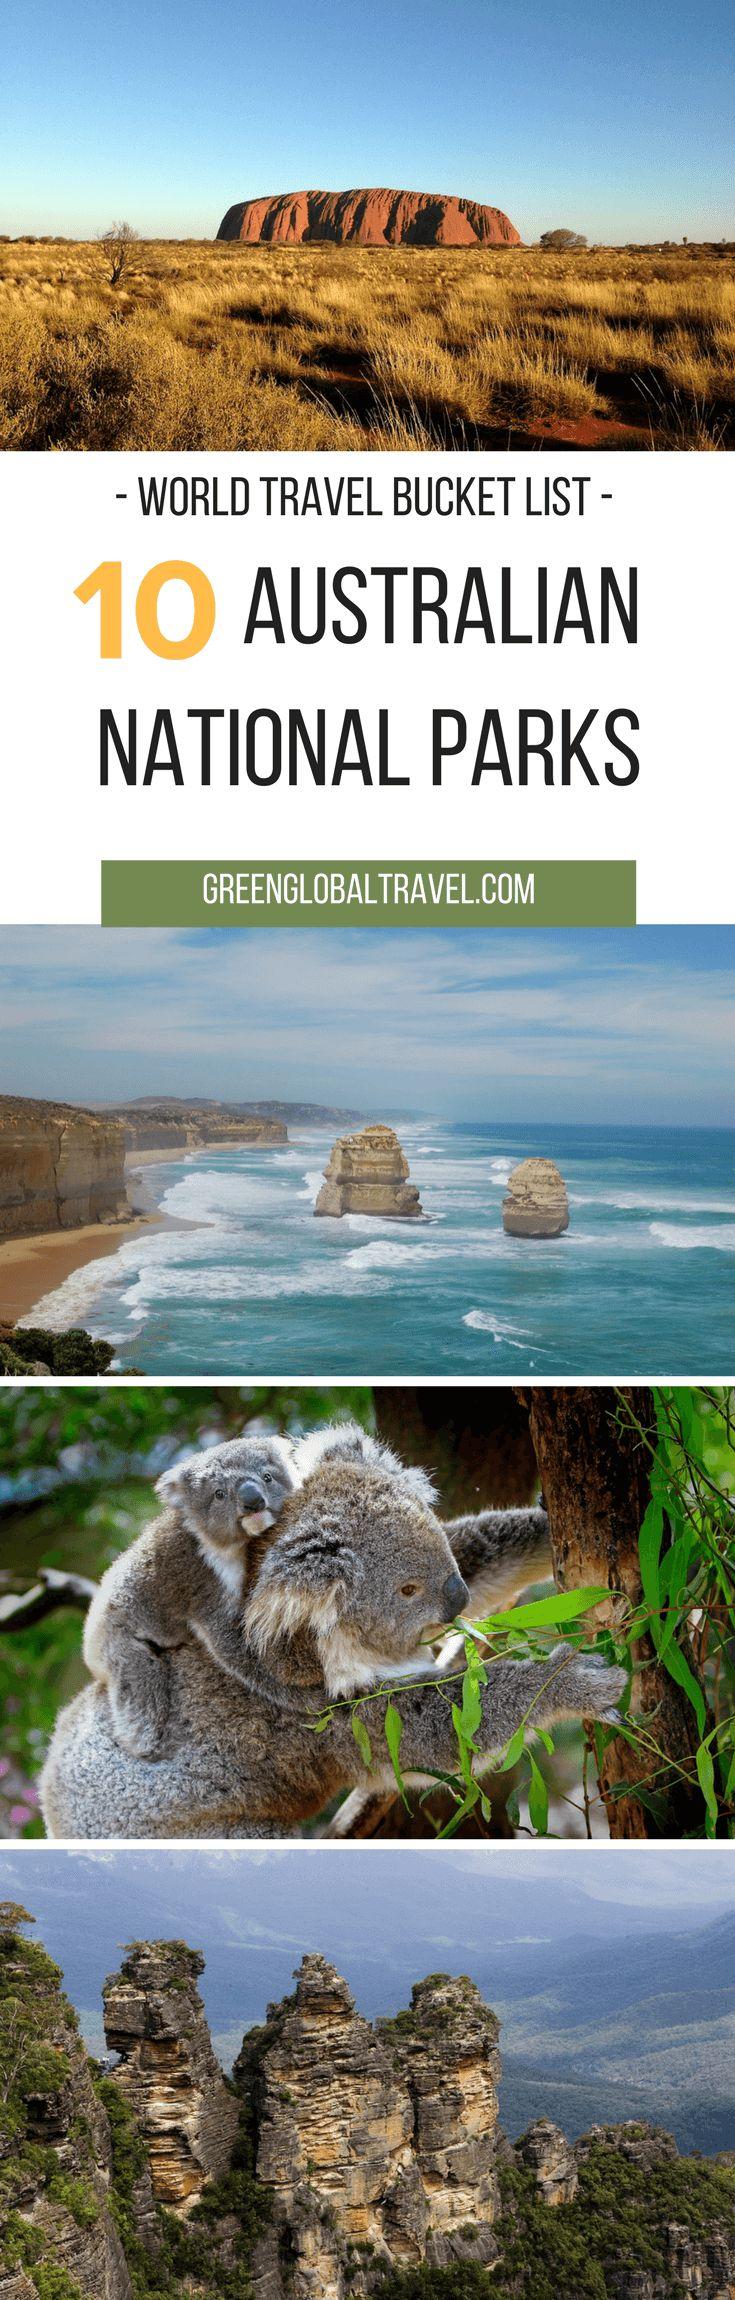 The Top 10 Australian National Parks For Your World Travel Bucket List, including Great Otway, Kakadu, Whitsunday Islands, Daintree, Uluru-Kata Tjuta, and more. via @greenglobaltrvl